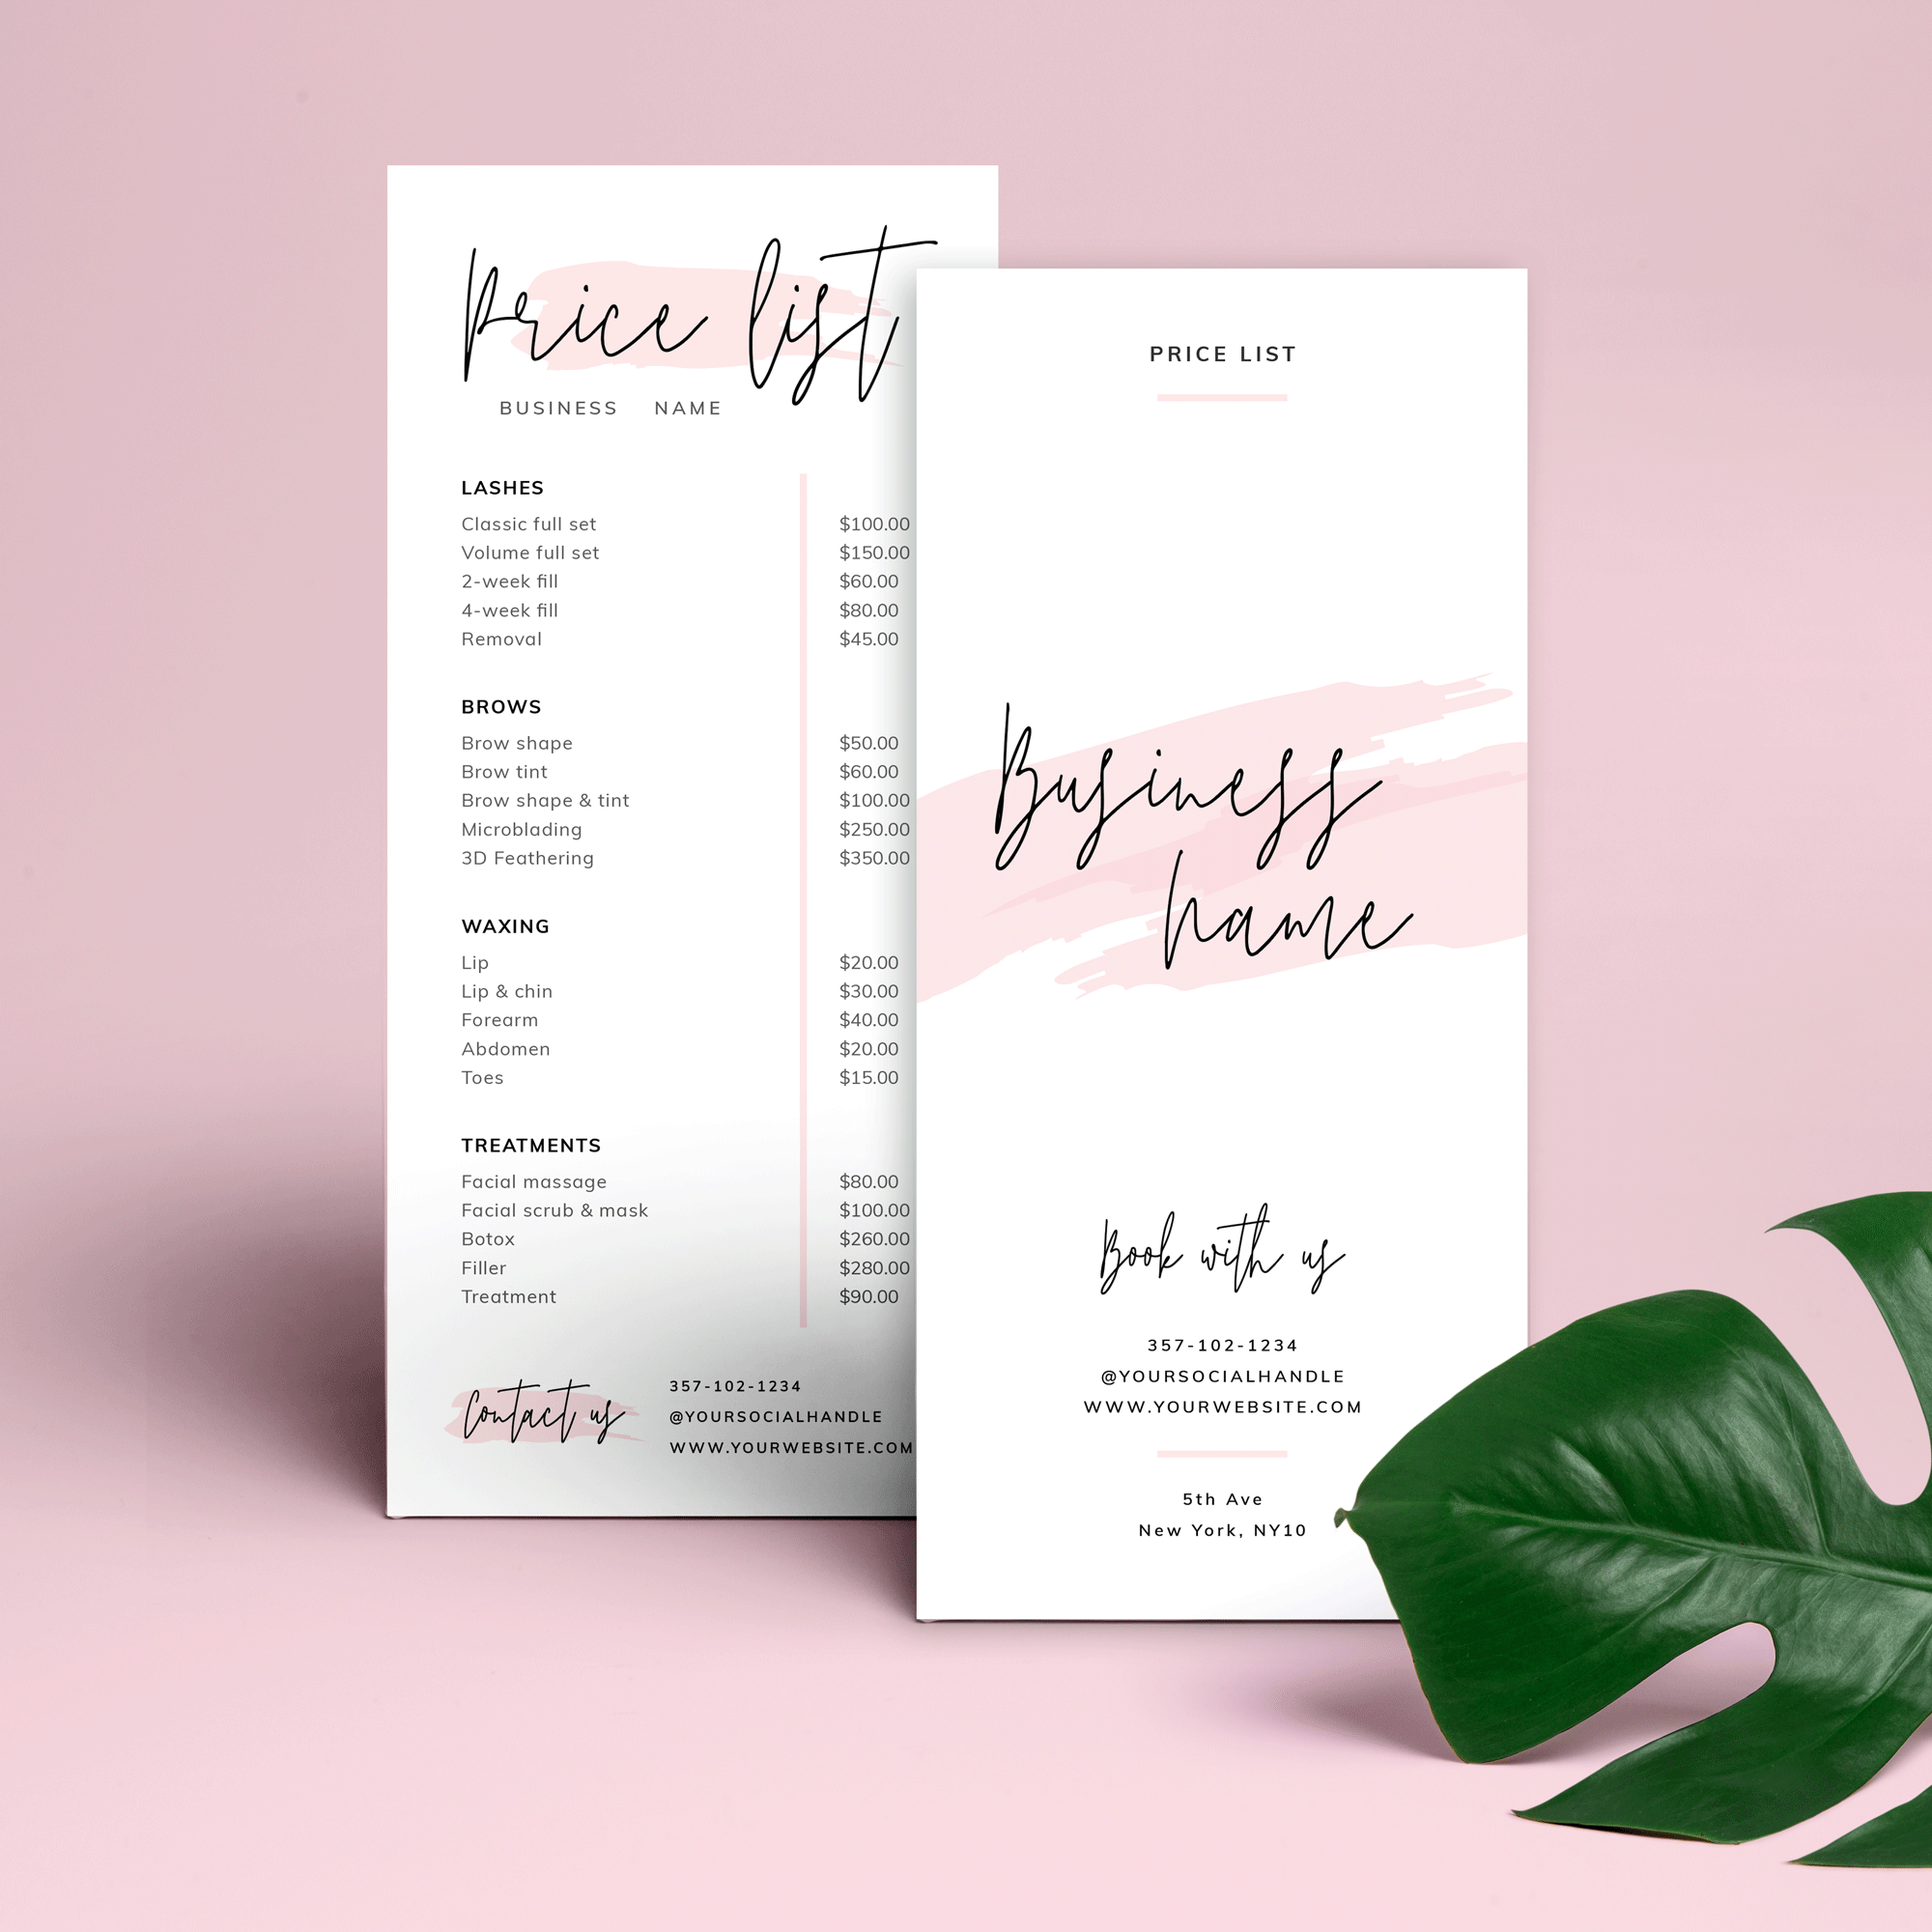 Feminine Price List Template Editable Beauty Pricelist Pink Watercolor In 2020 Price List Template List Template Price List